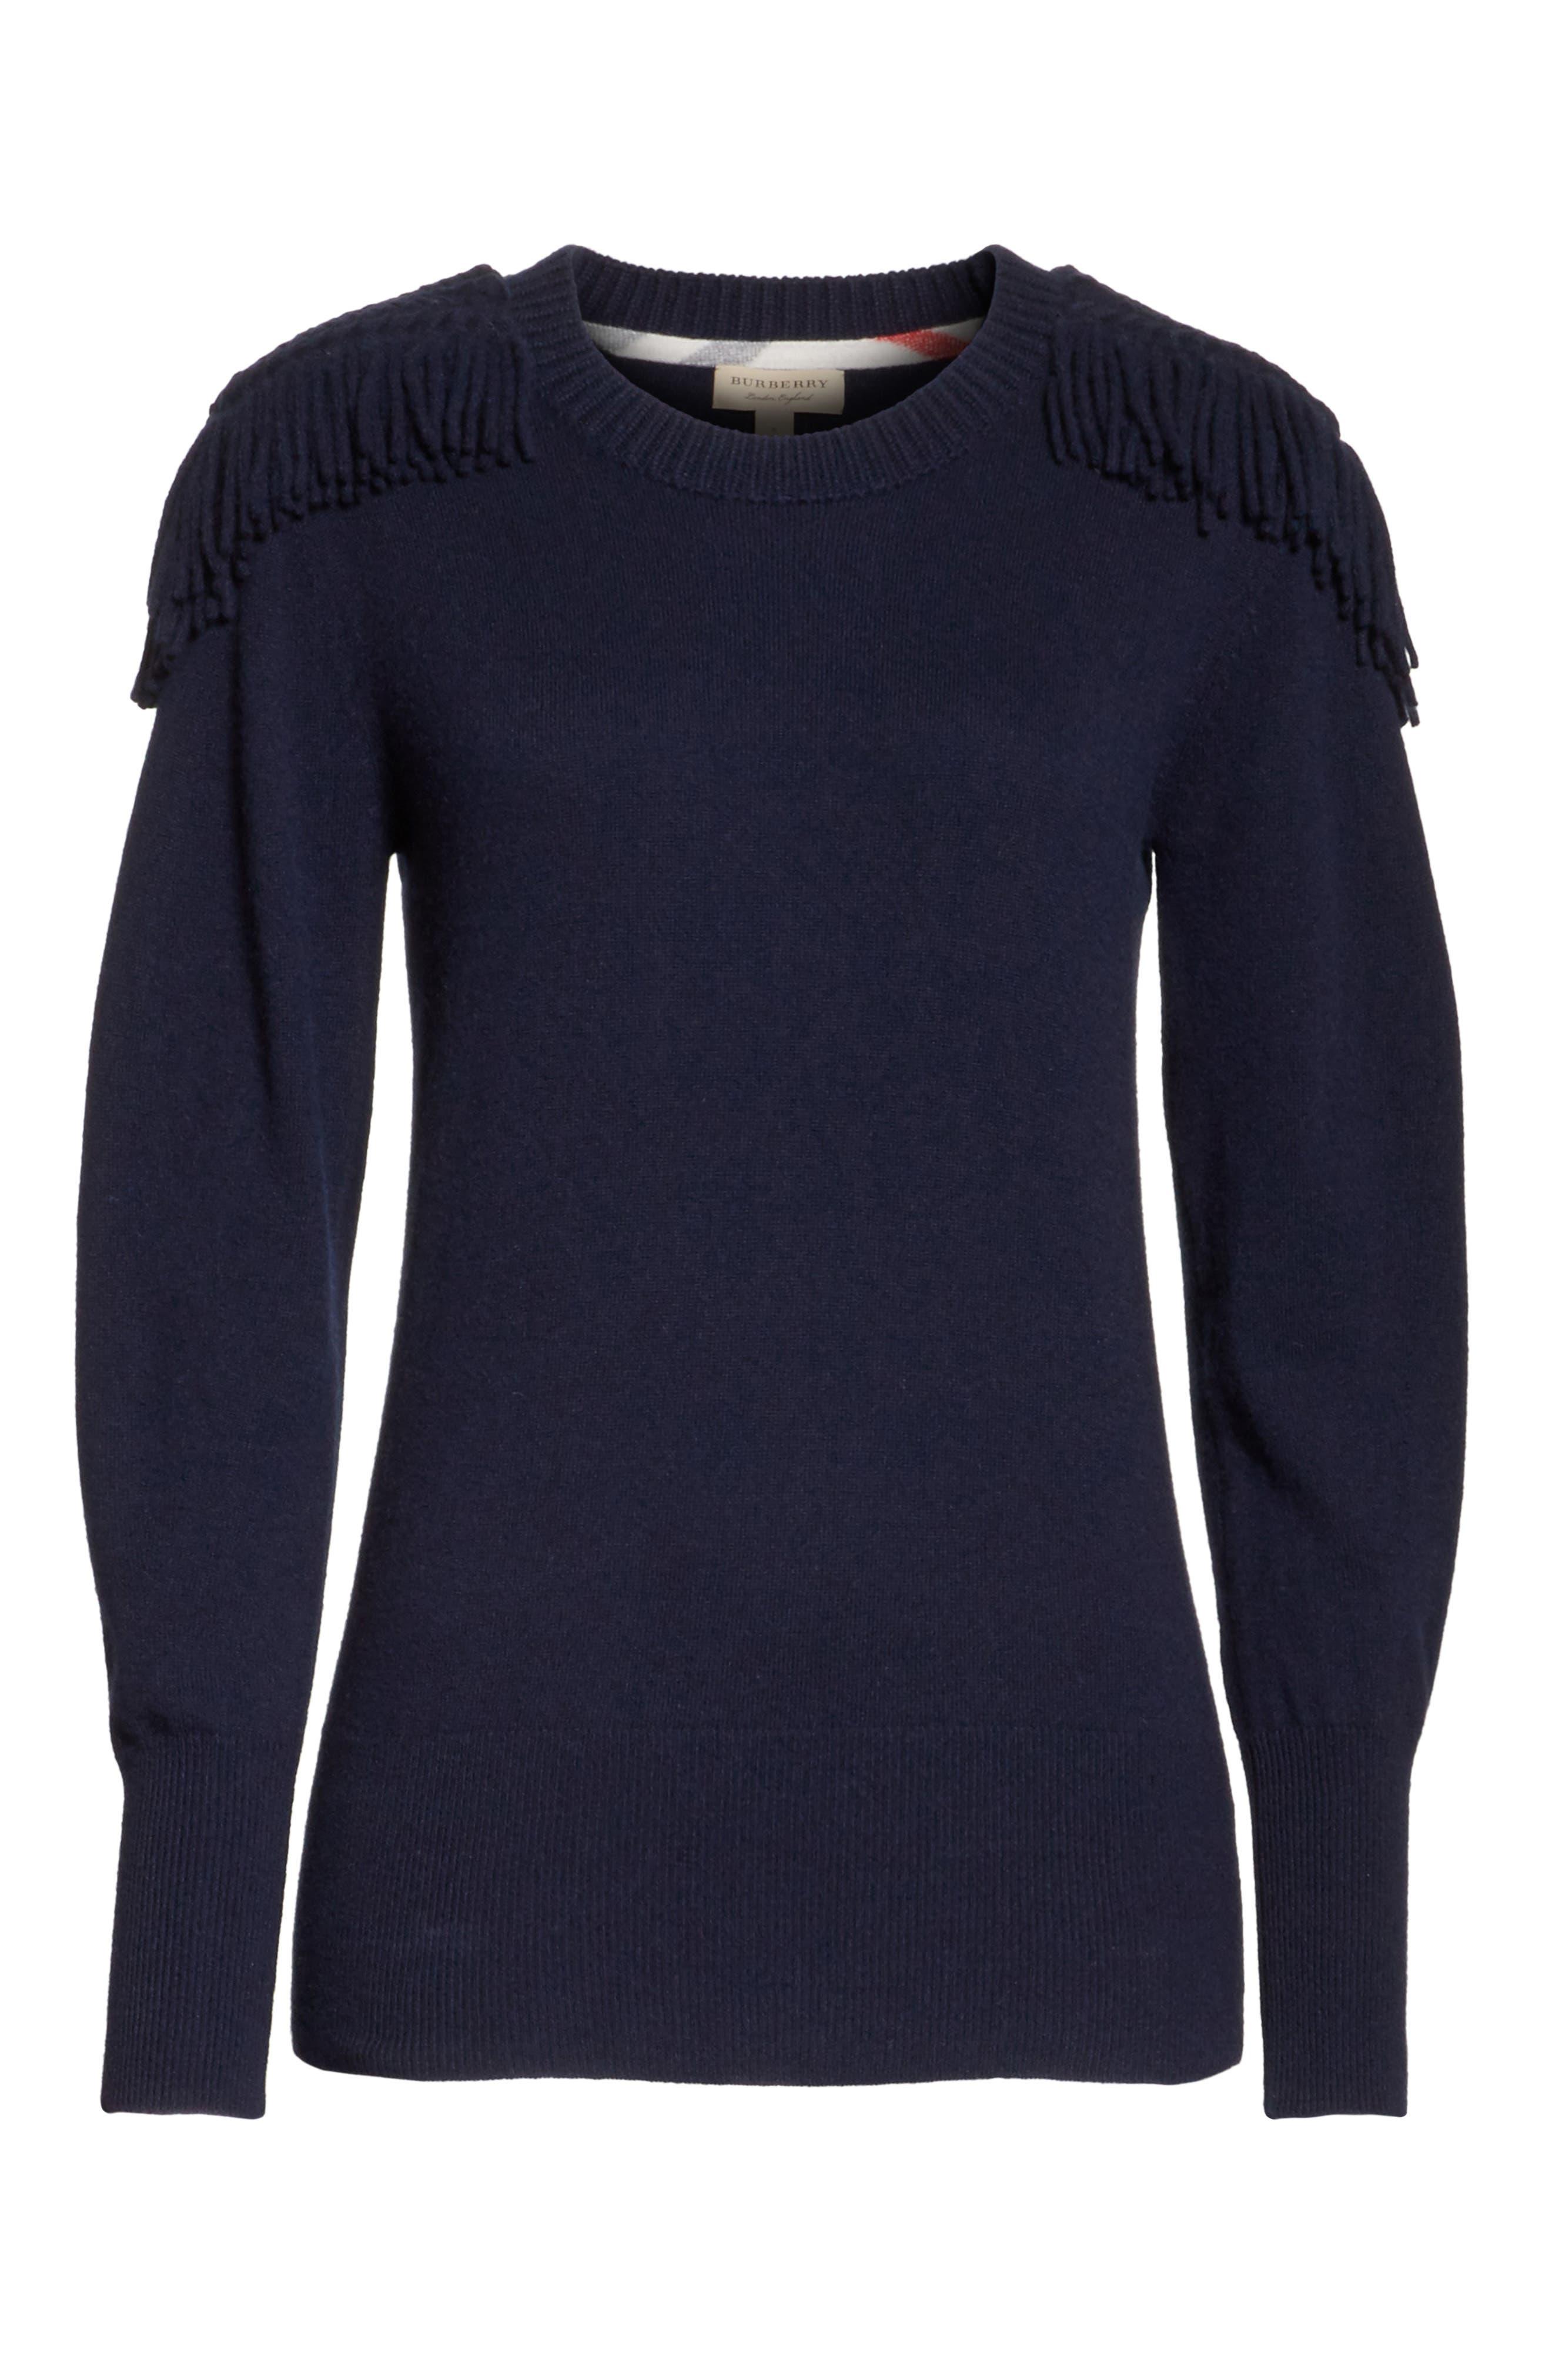 Livenza Wool & Cashmere Fringe Sweater,                             Alternate thumbnail 6, color,                             410